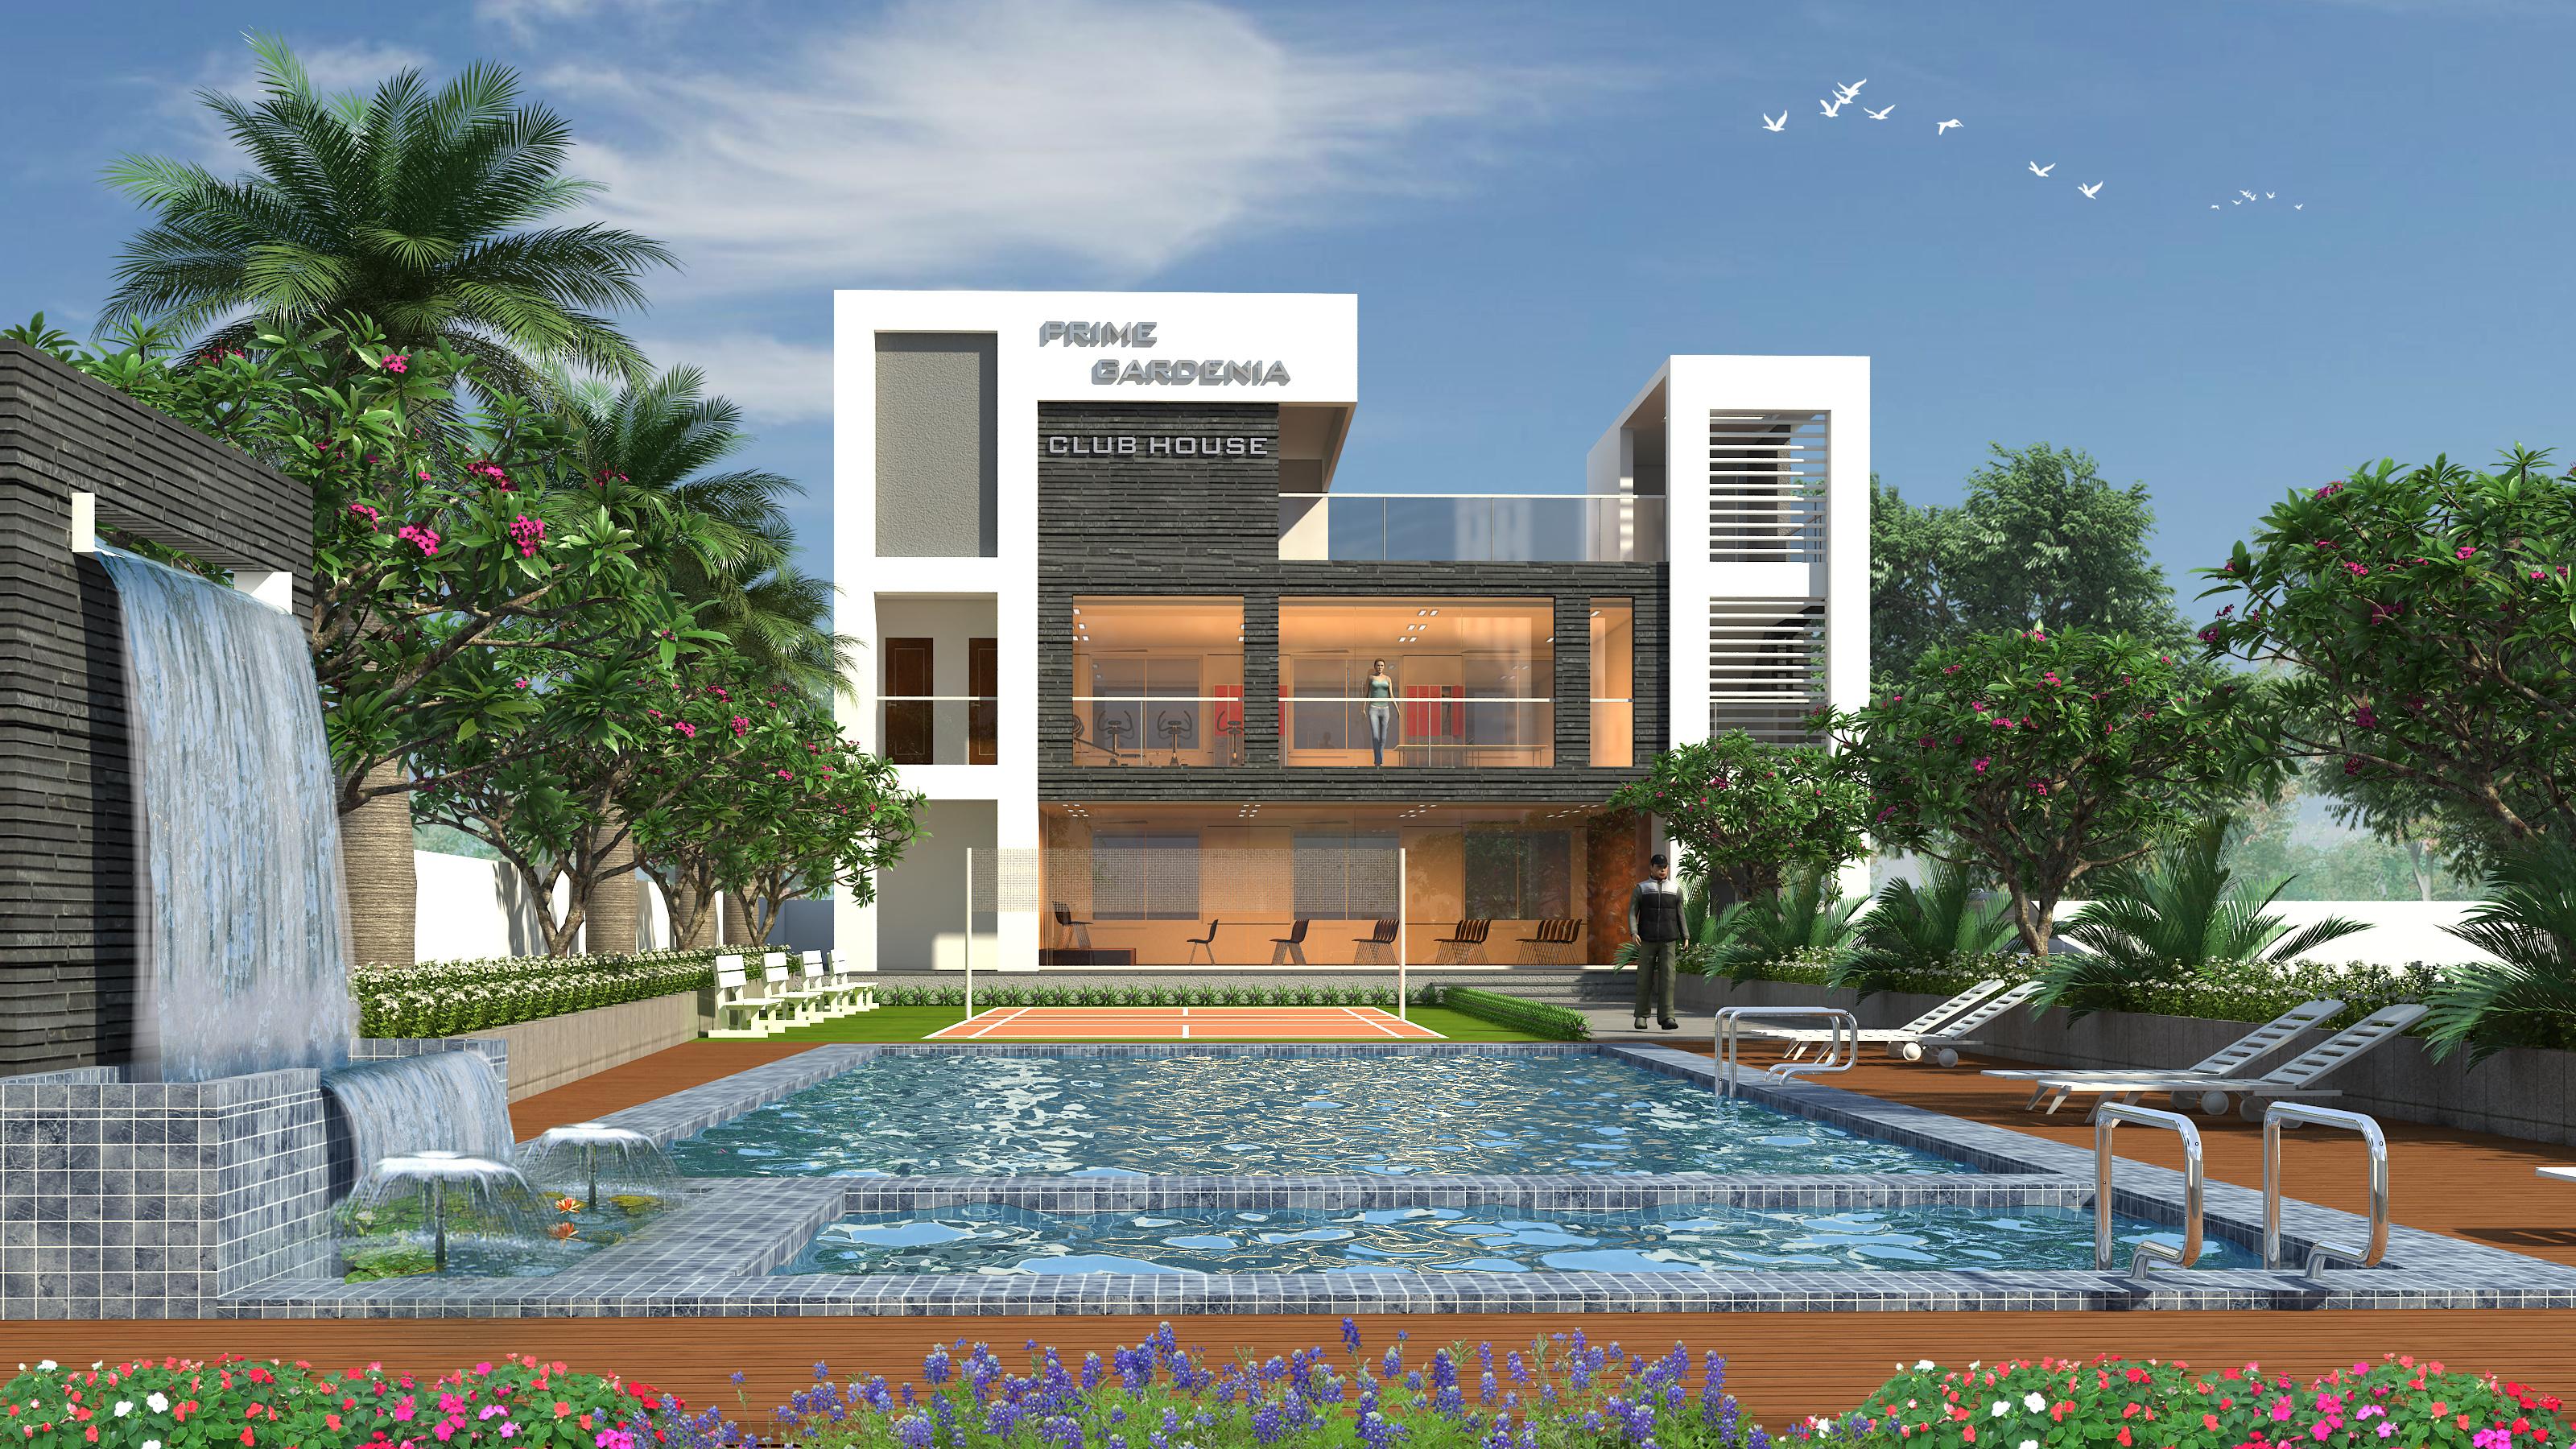 Prime gardenia in nizampet hyderabad price location - Swimming pool construction cost in hyderabad ...